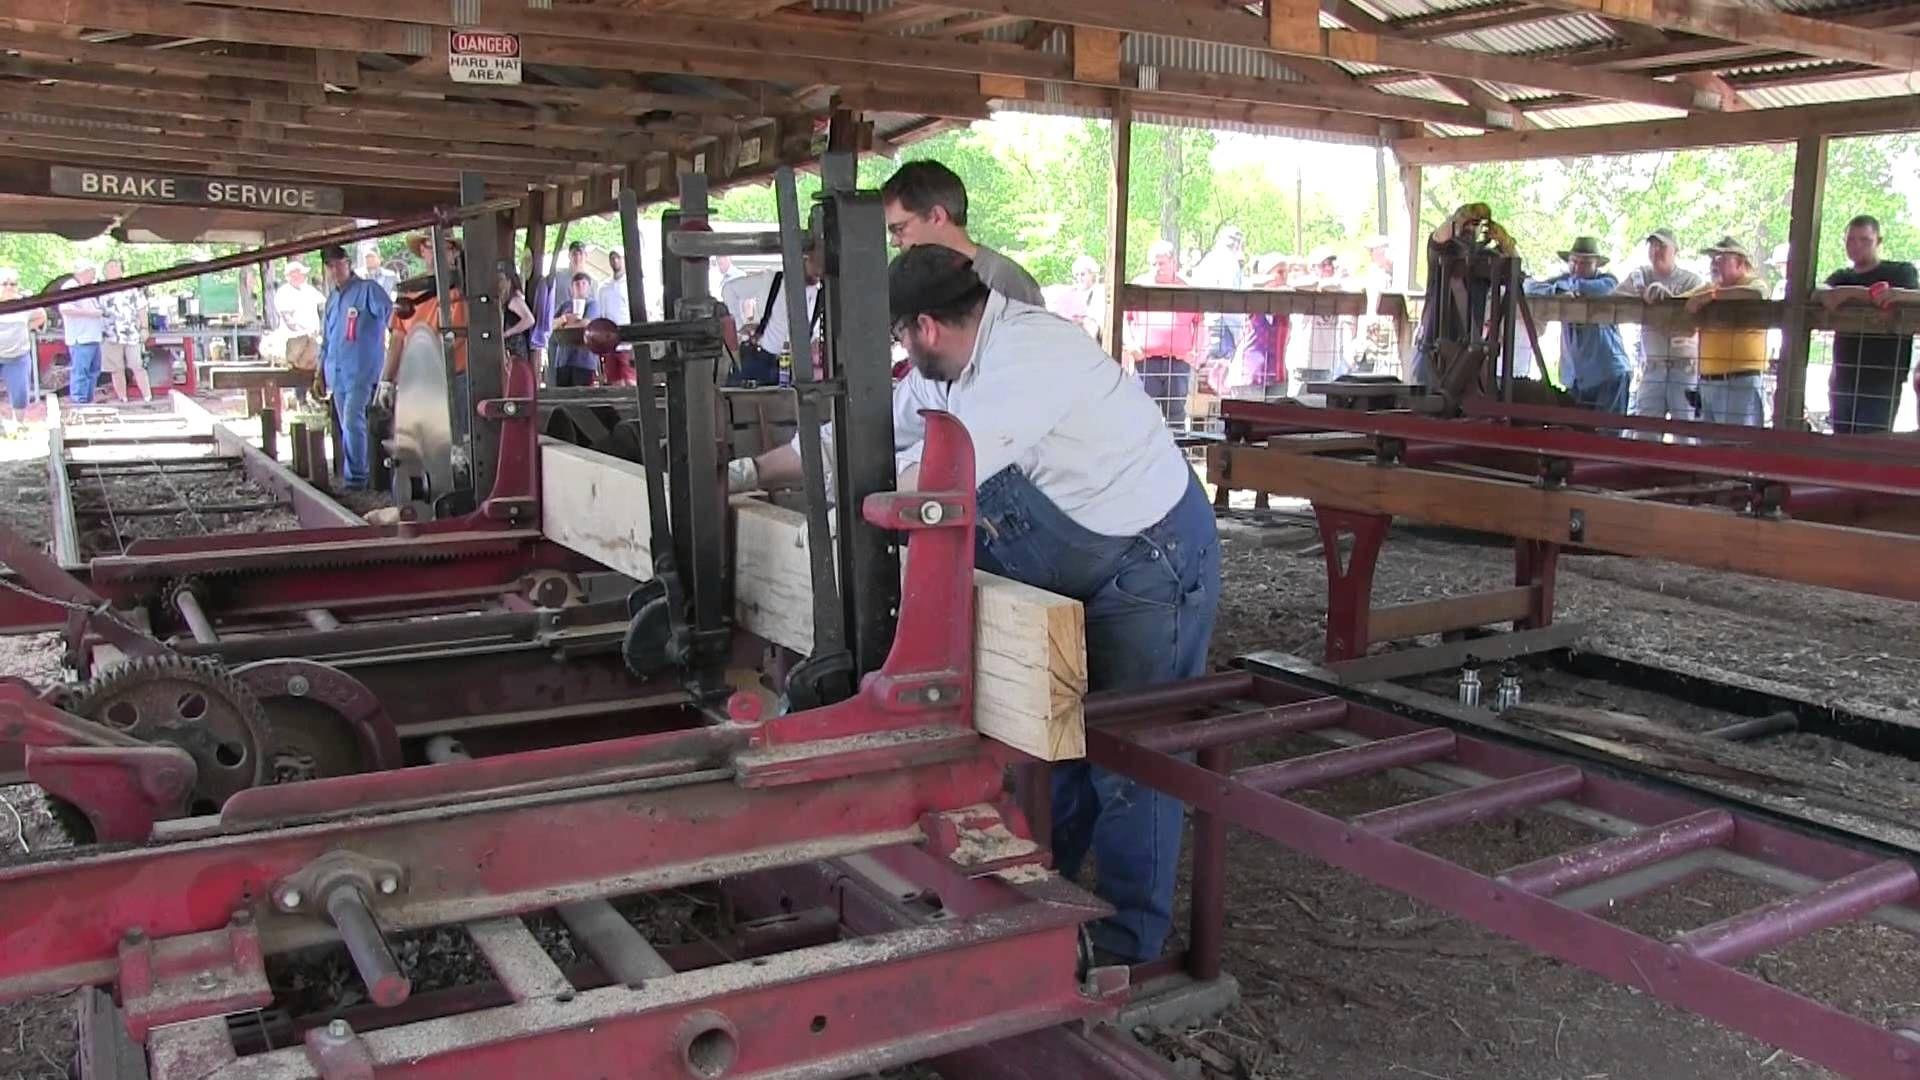 Pawnee OK Sawmill 2015 Sawmill, Antique tractors, Pawnee